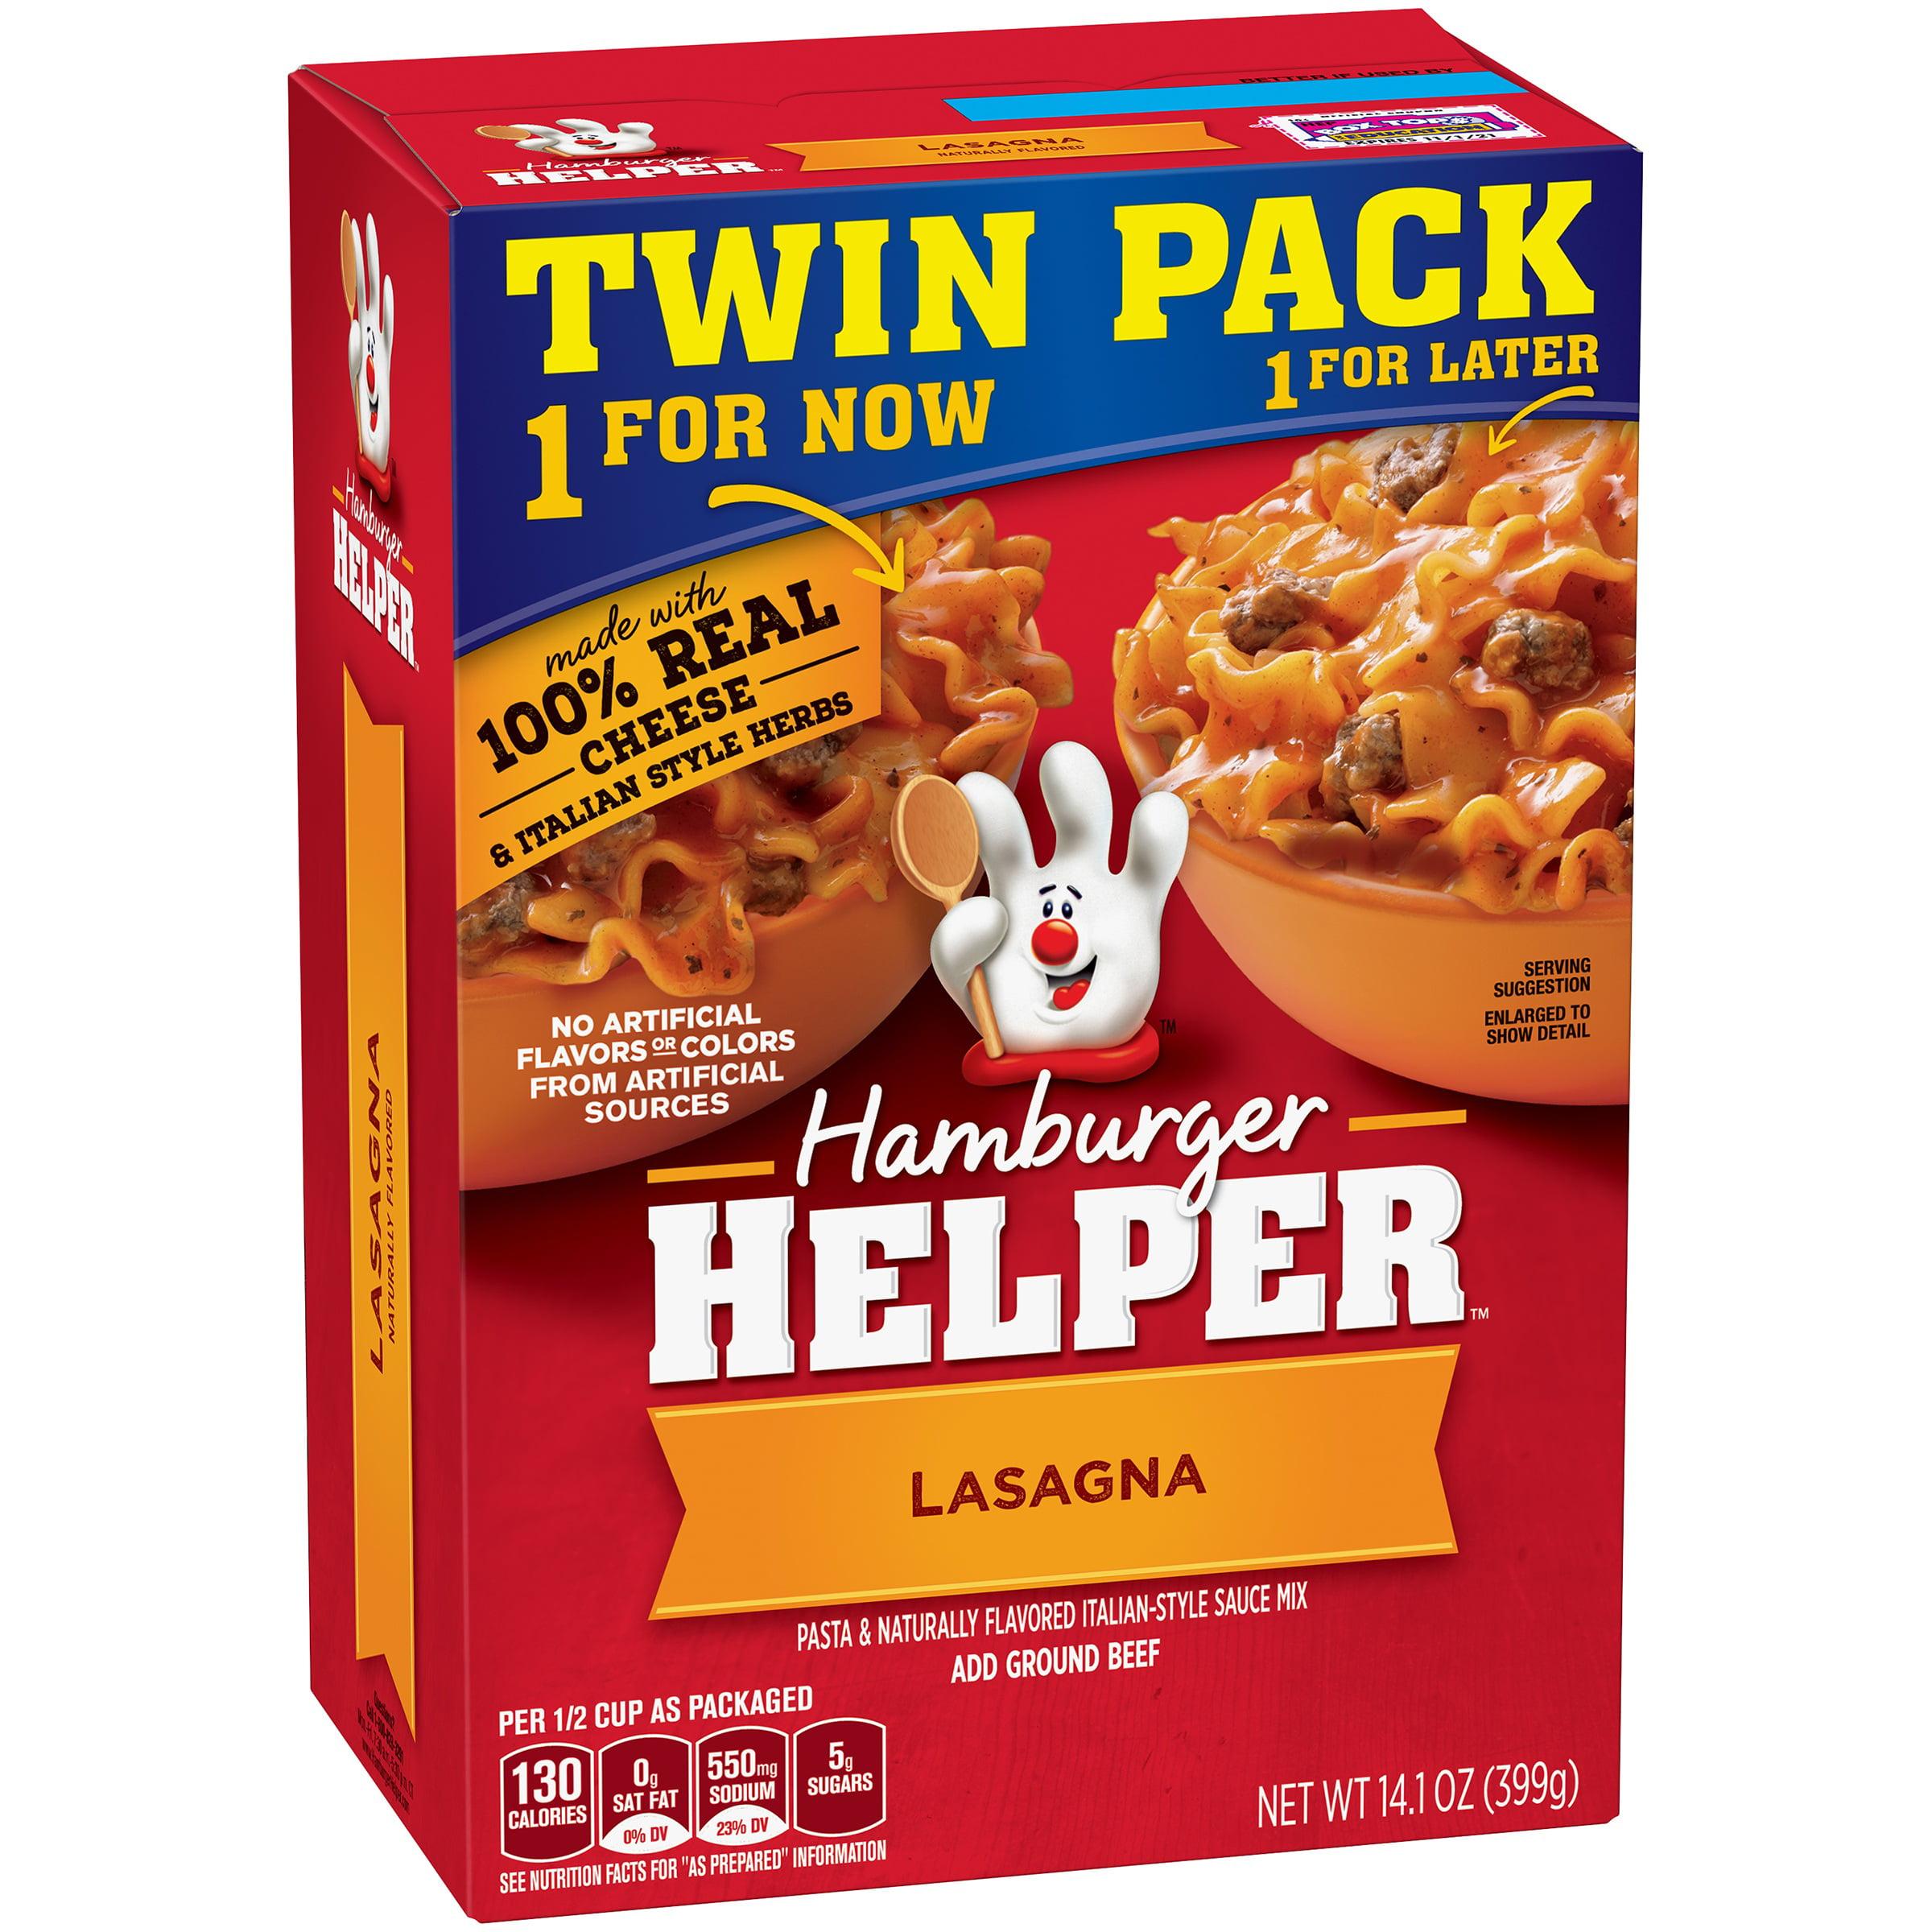 Betty Crocker Lasagna Hamburger Helper 14.1 oz. Box by General Mills Sales, Inc.